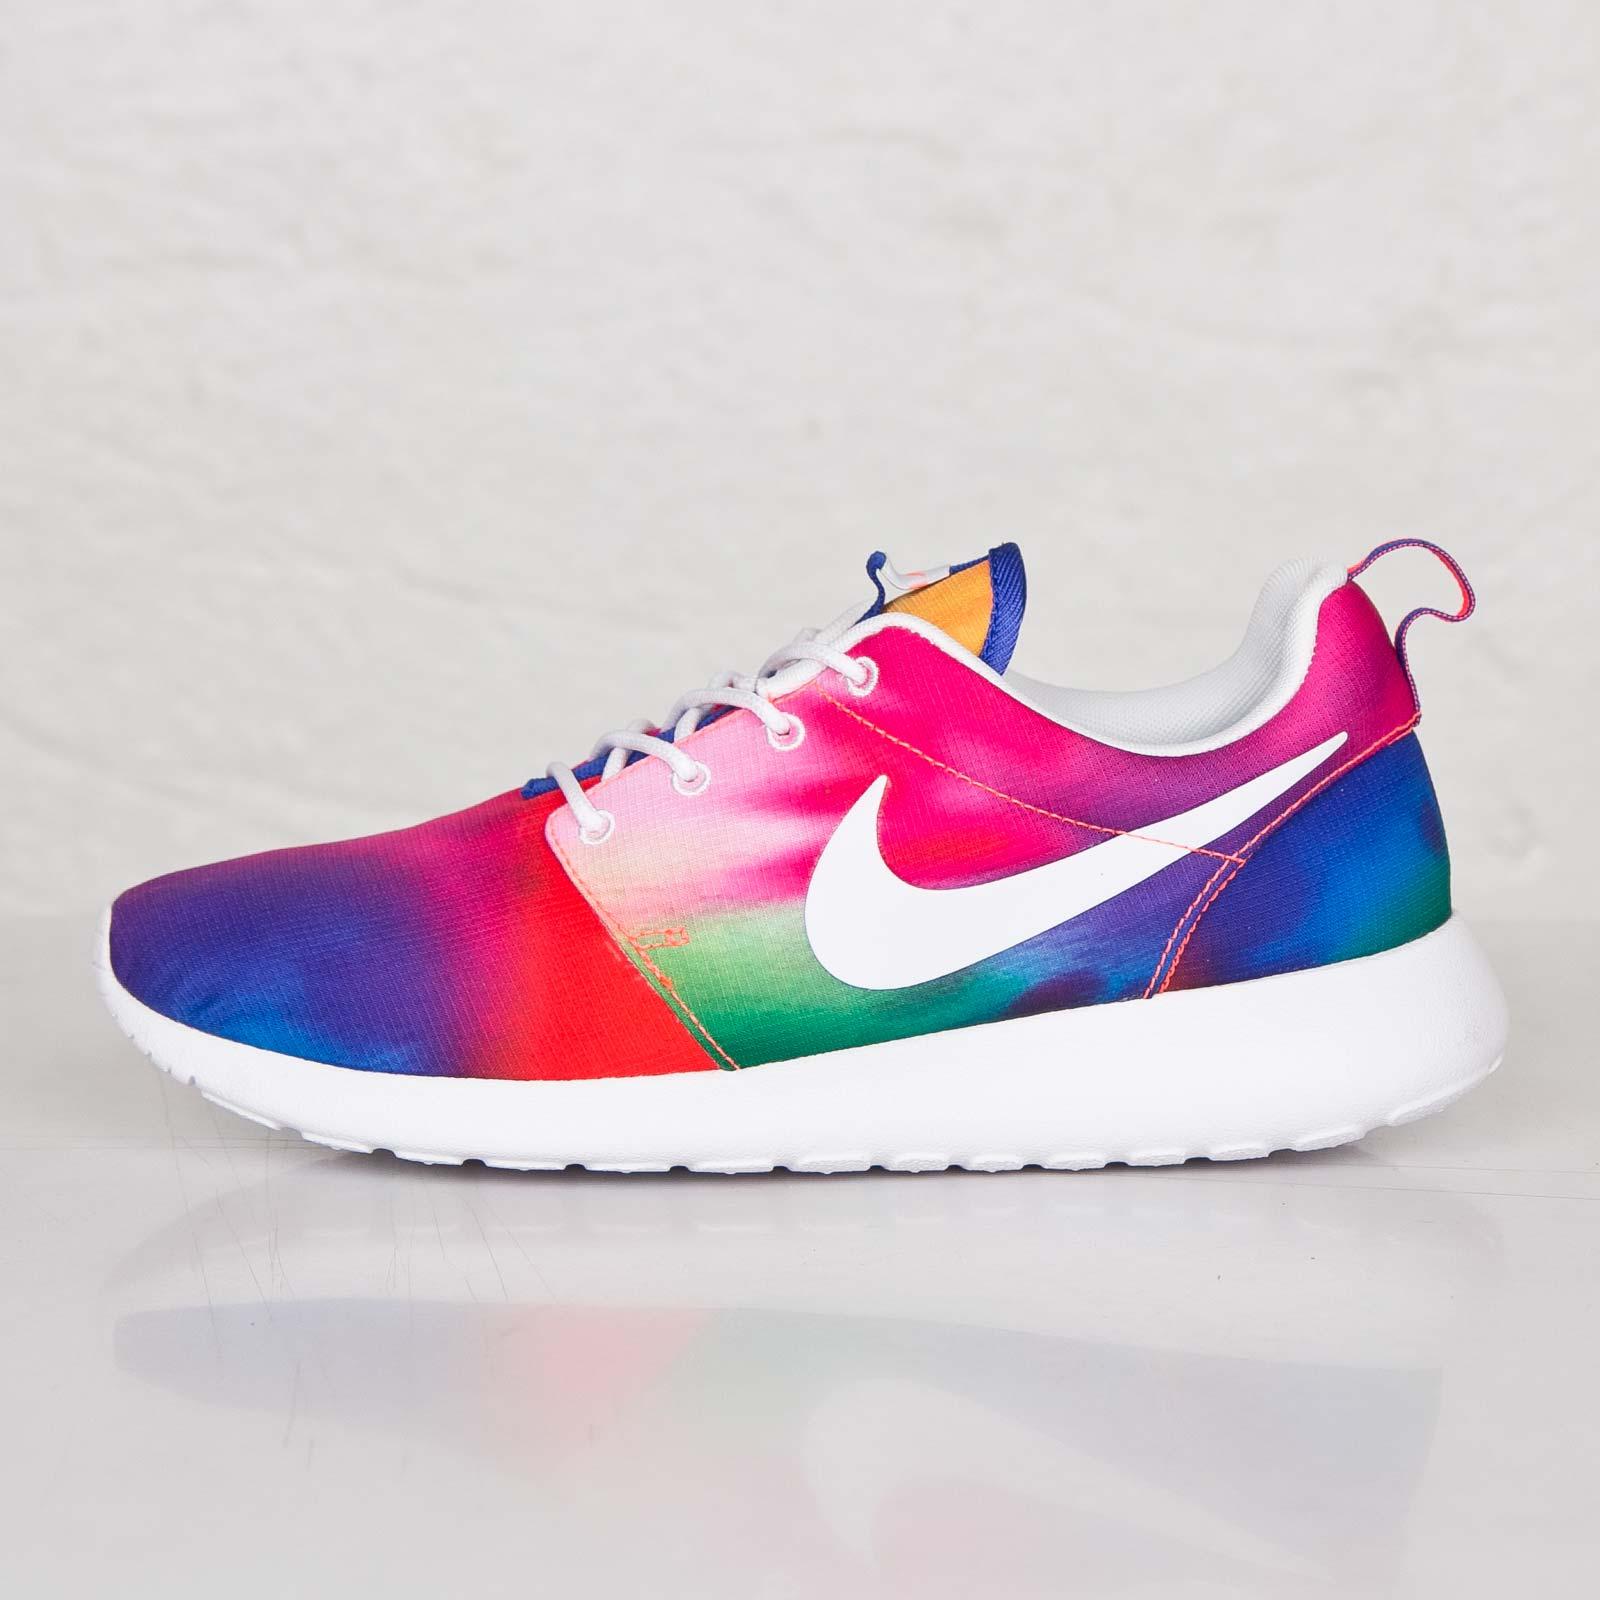 Nike Roshe Run Print - 655206-518